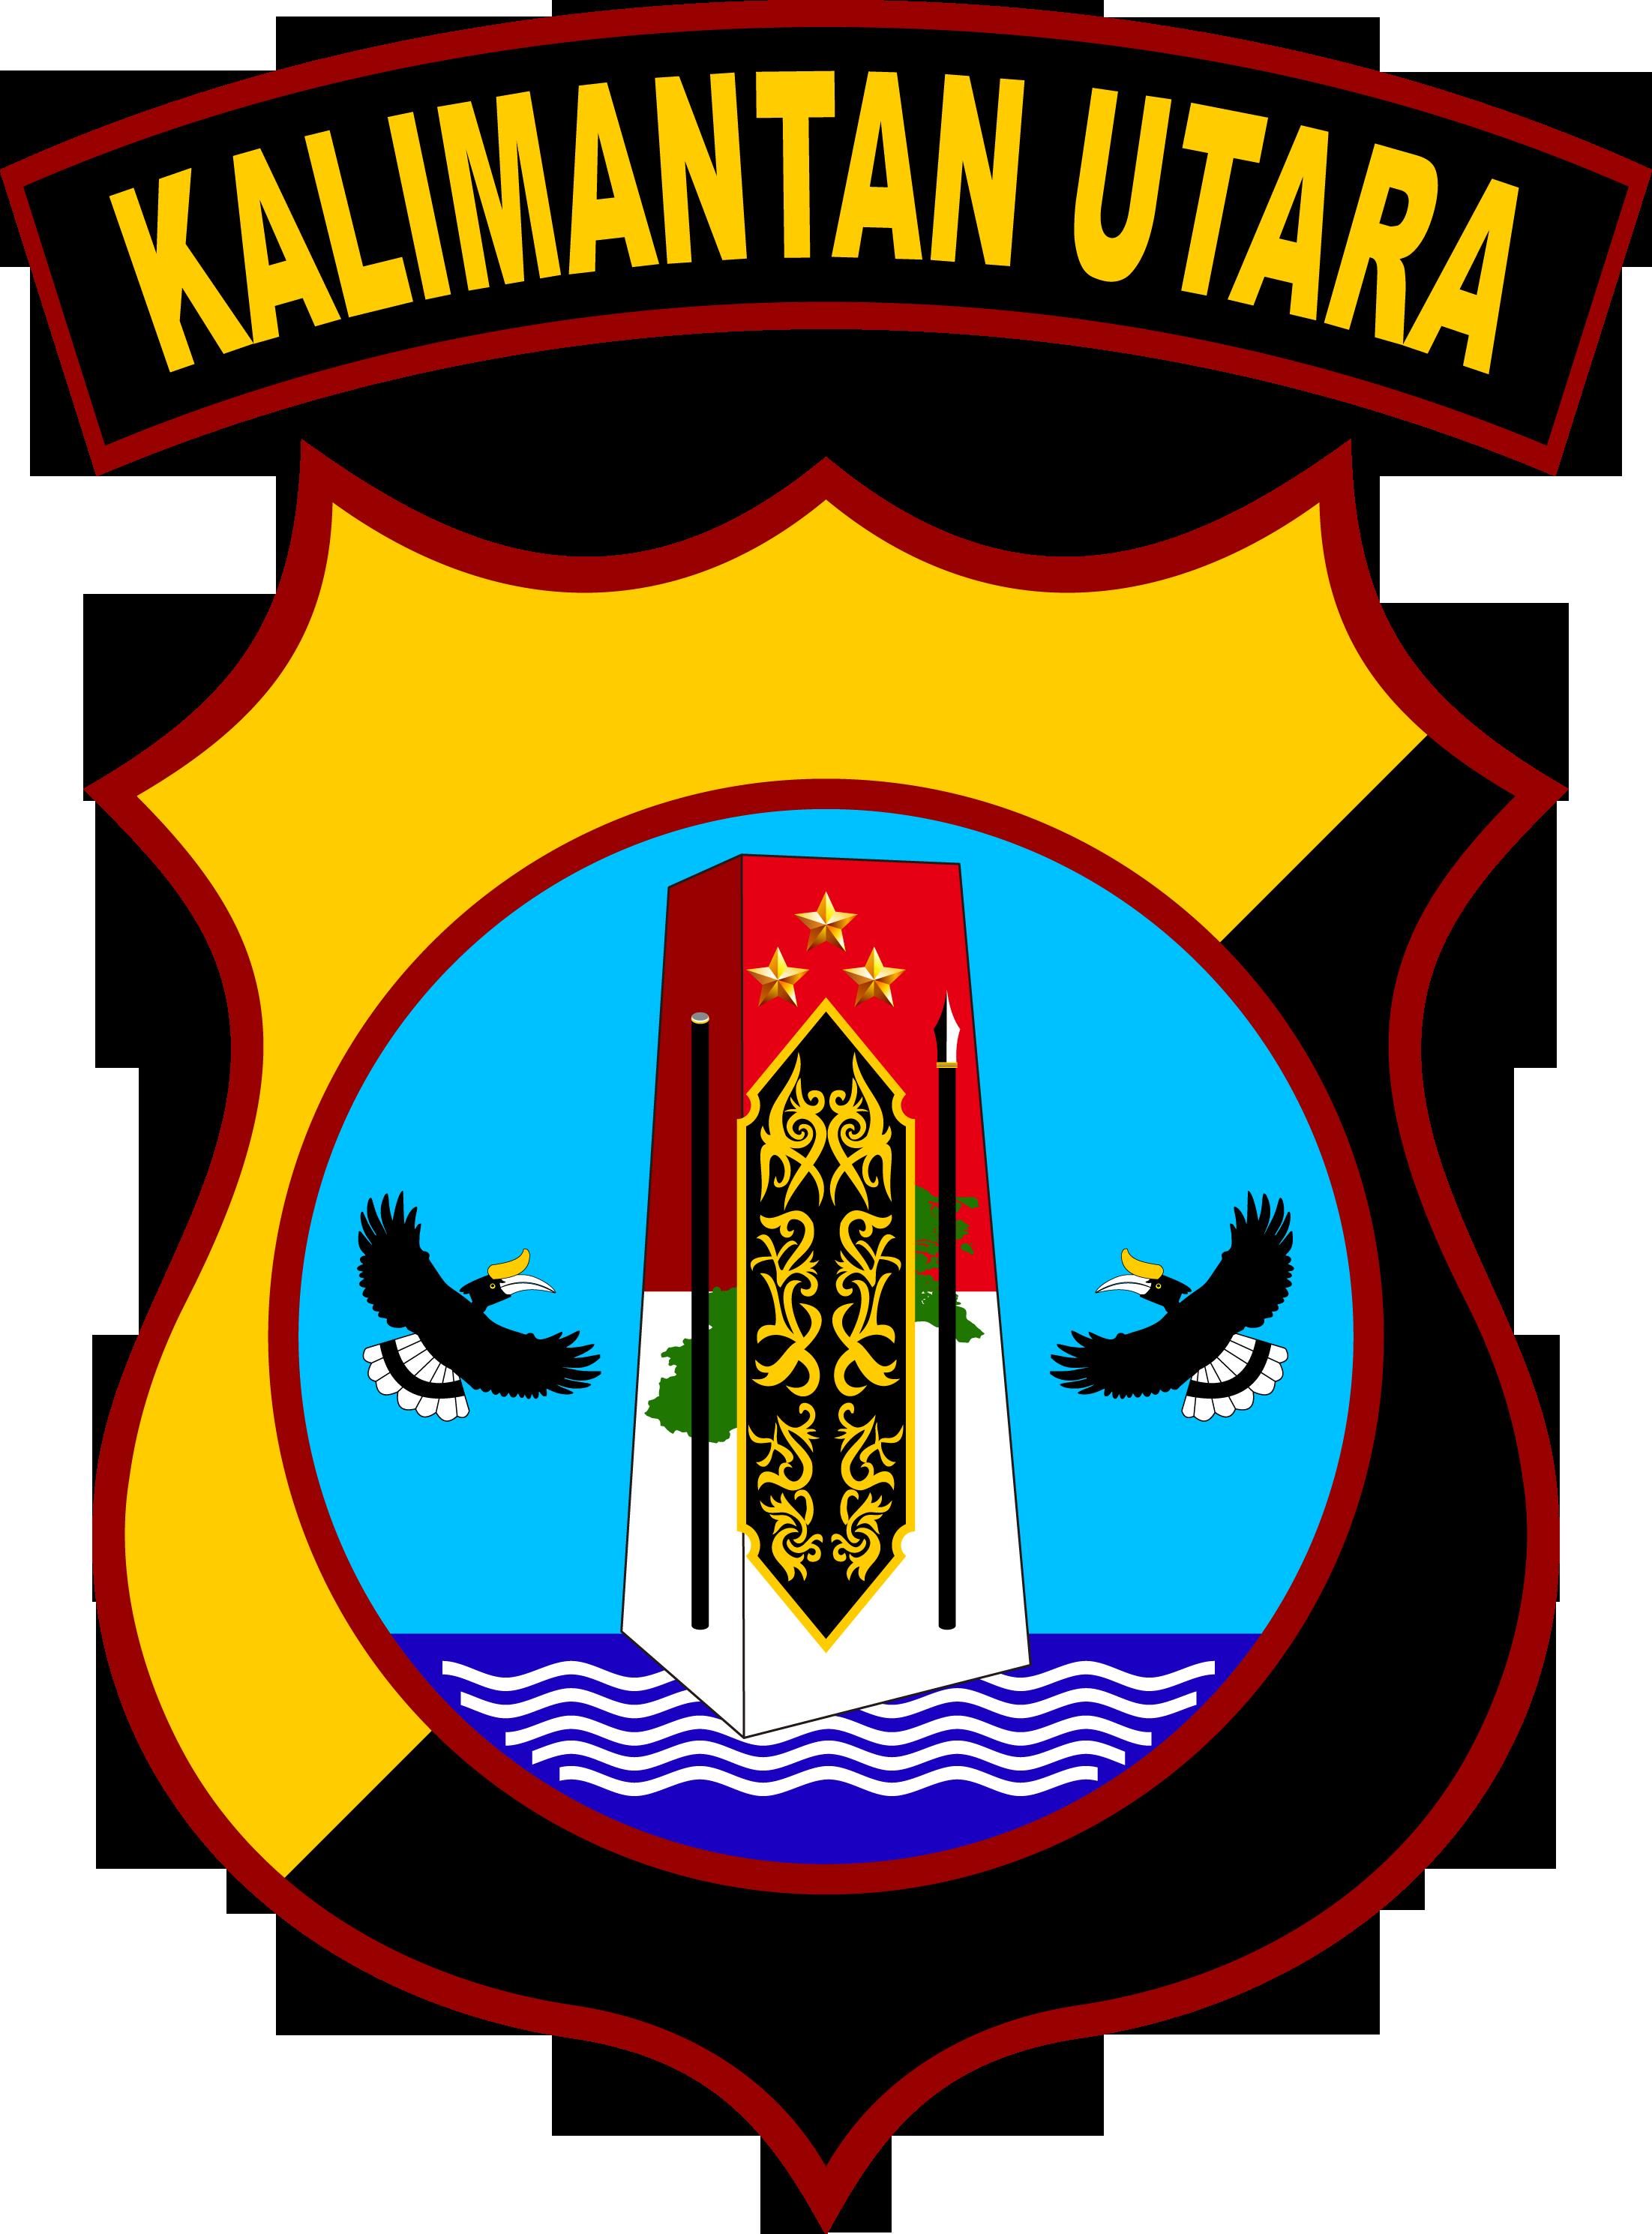 Kepolisian Daerah Kalimantan Utara Wikipedia Bahasa Indonesia Ensiklopedia Bebas